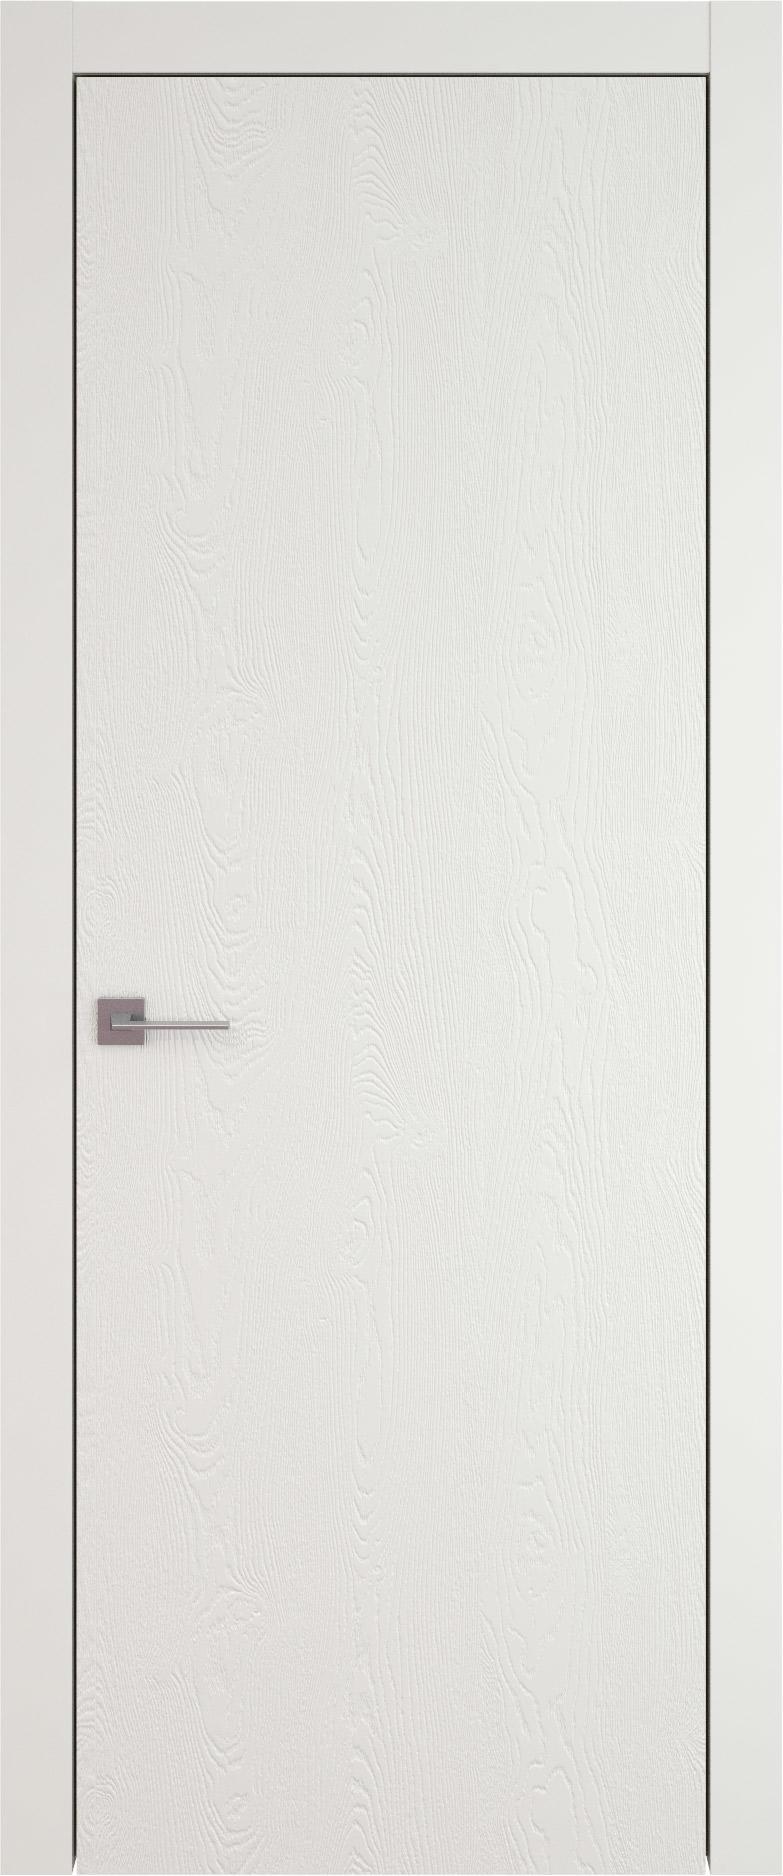 Tivoli А-1 цвет - Бежевая эмаль по шпону (RAL 9010) Без стекла (ДГ)